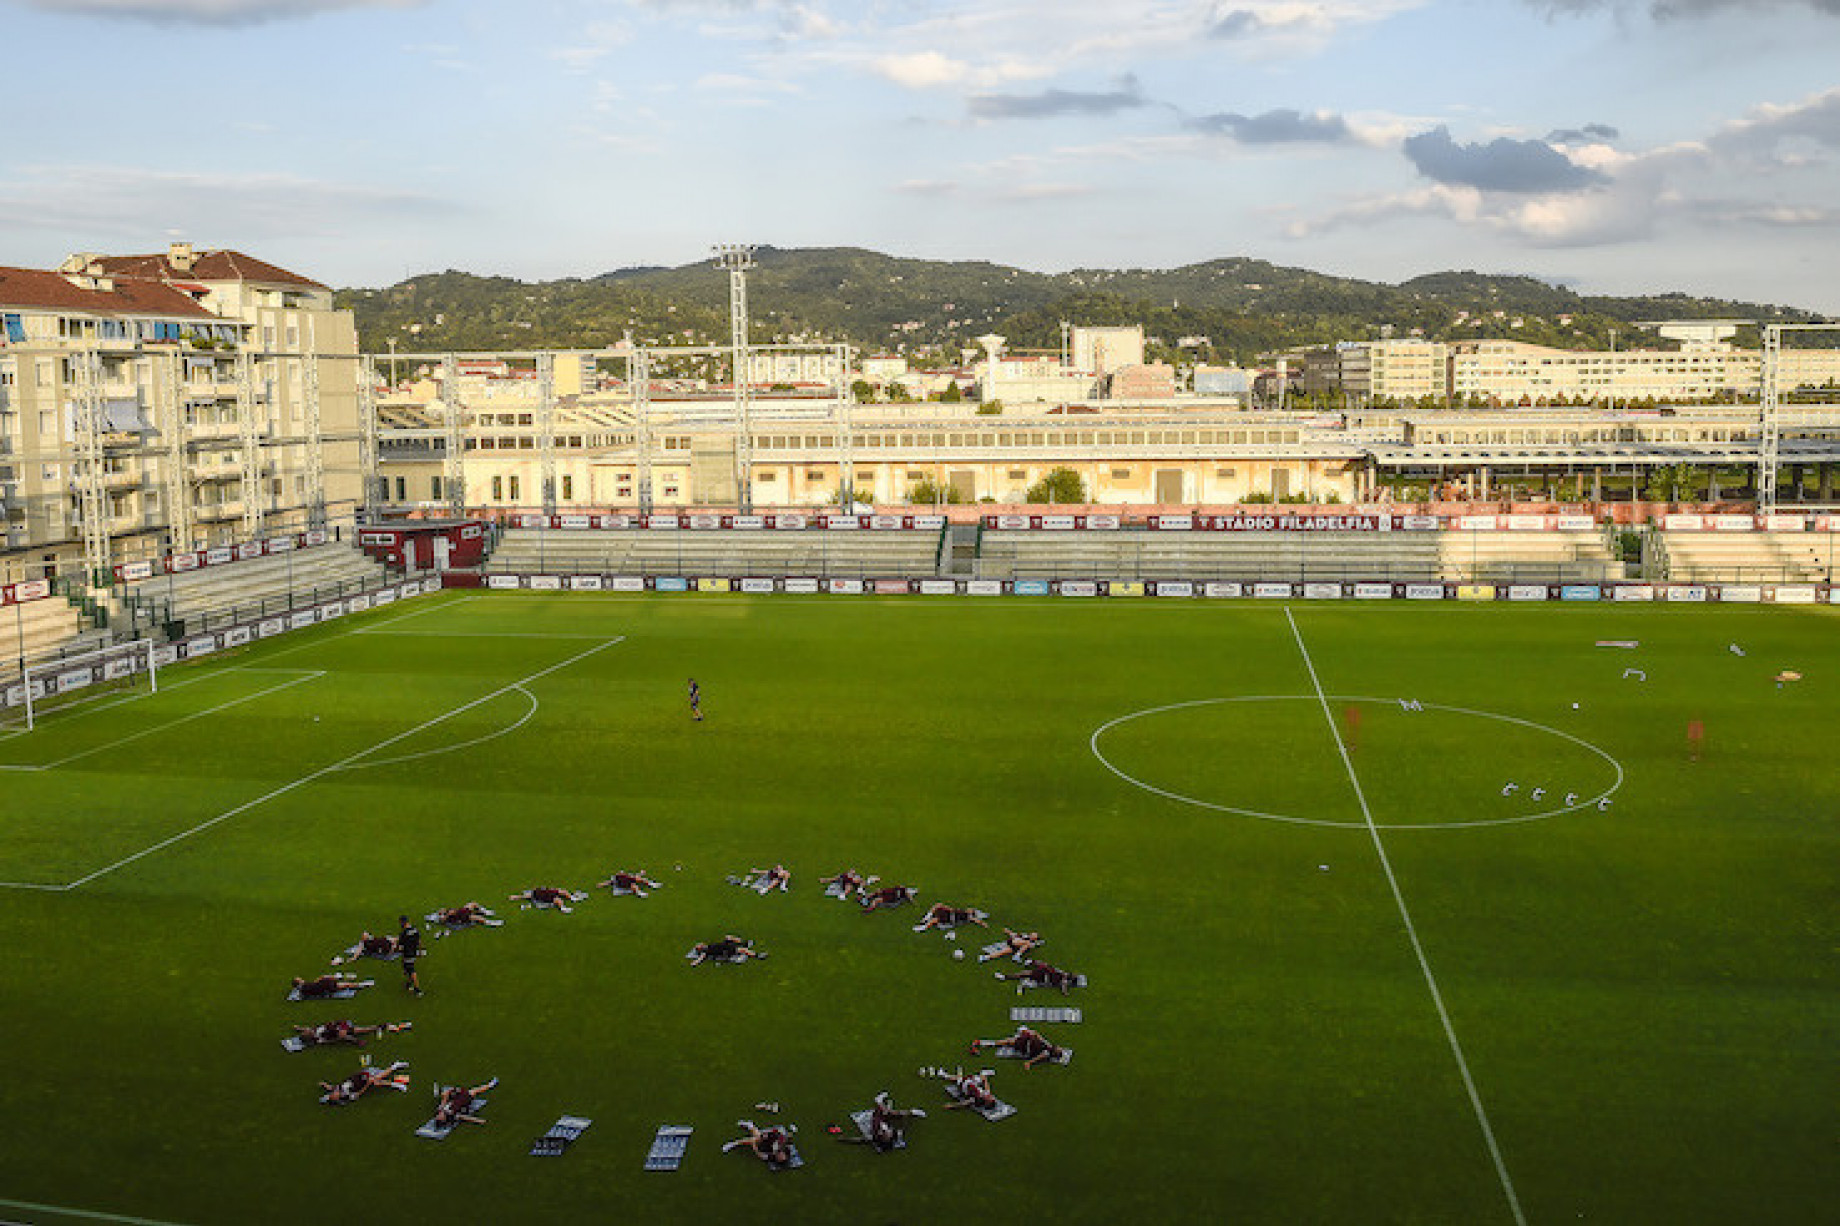 Torino allenamento filadelfia IMAGE.jpg